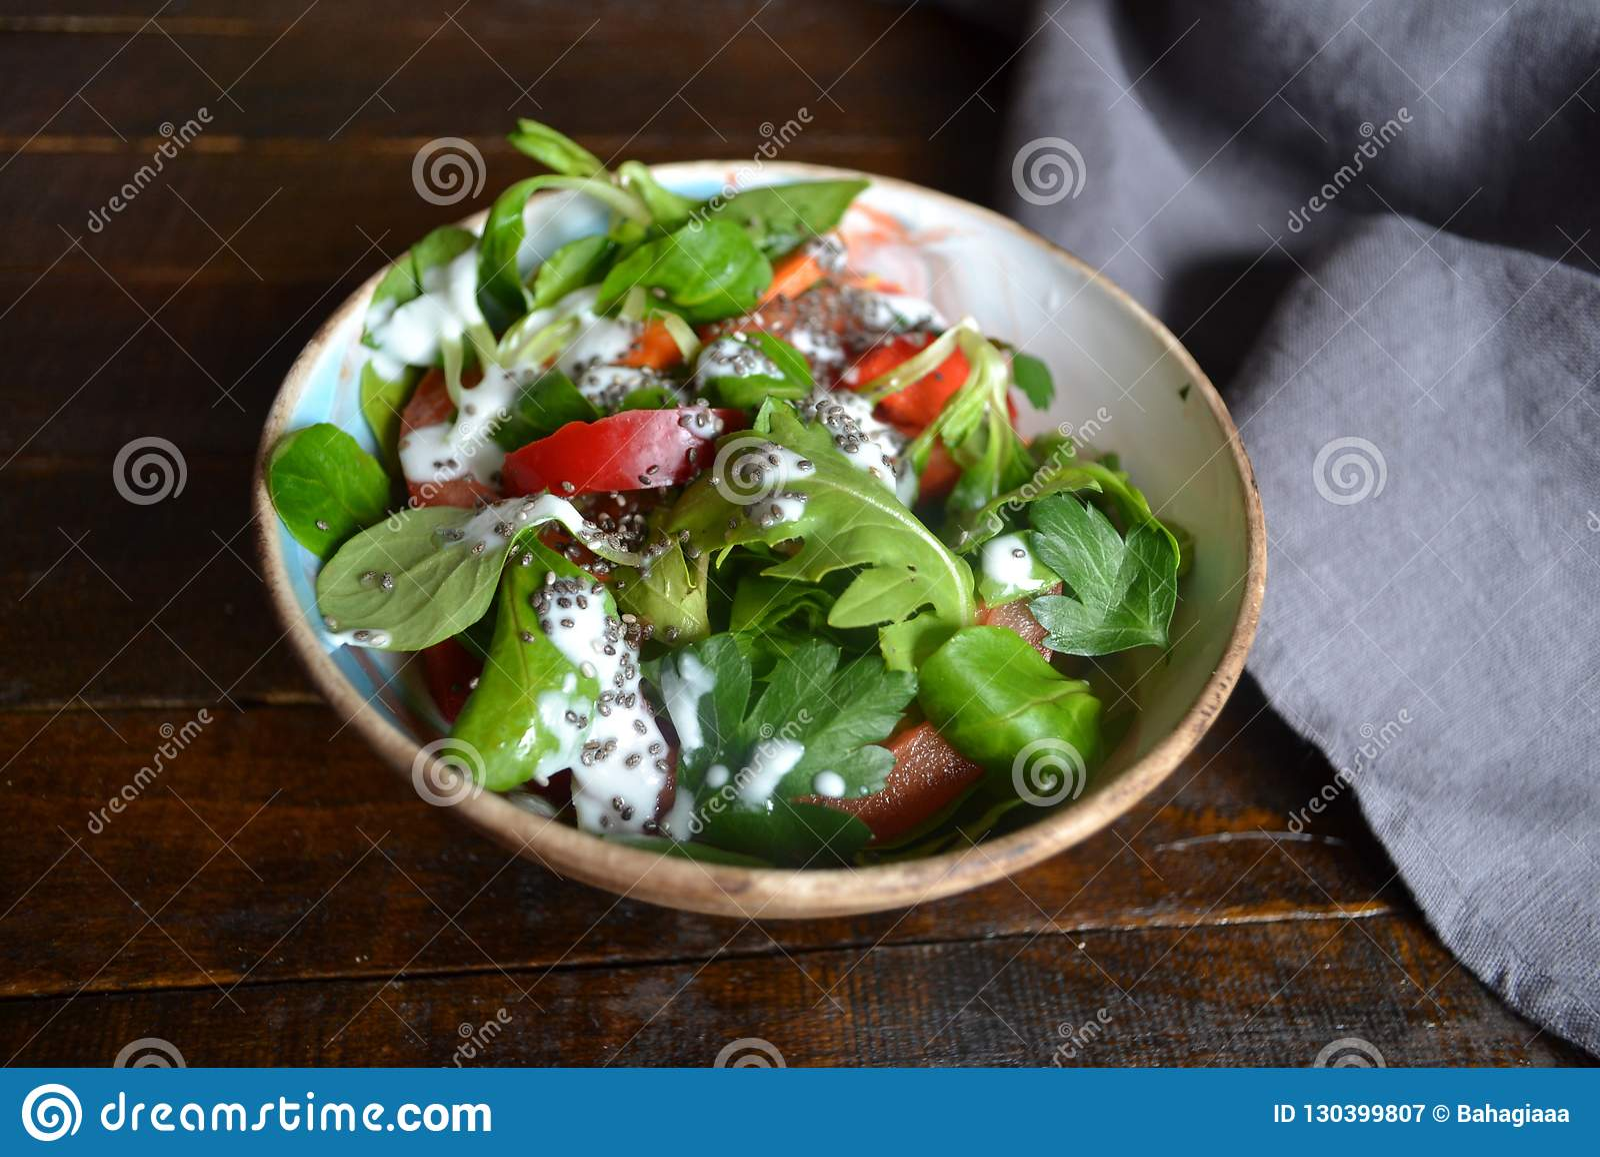 dieta con yogurt e insalata